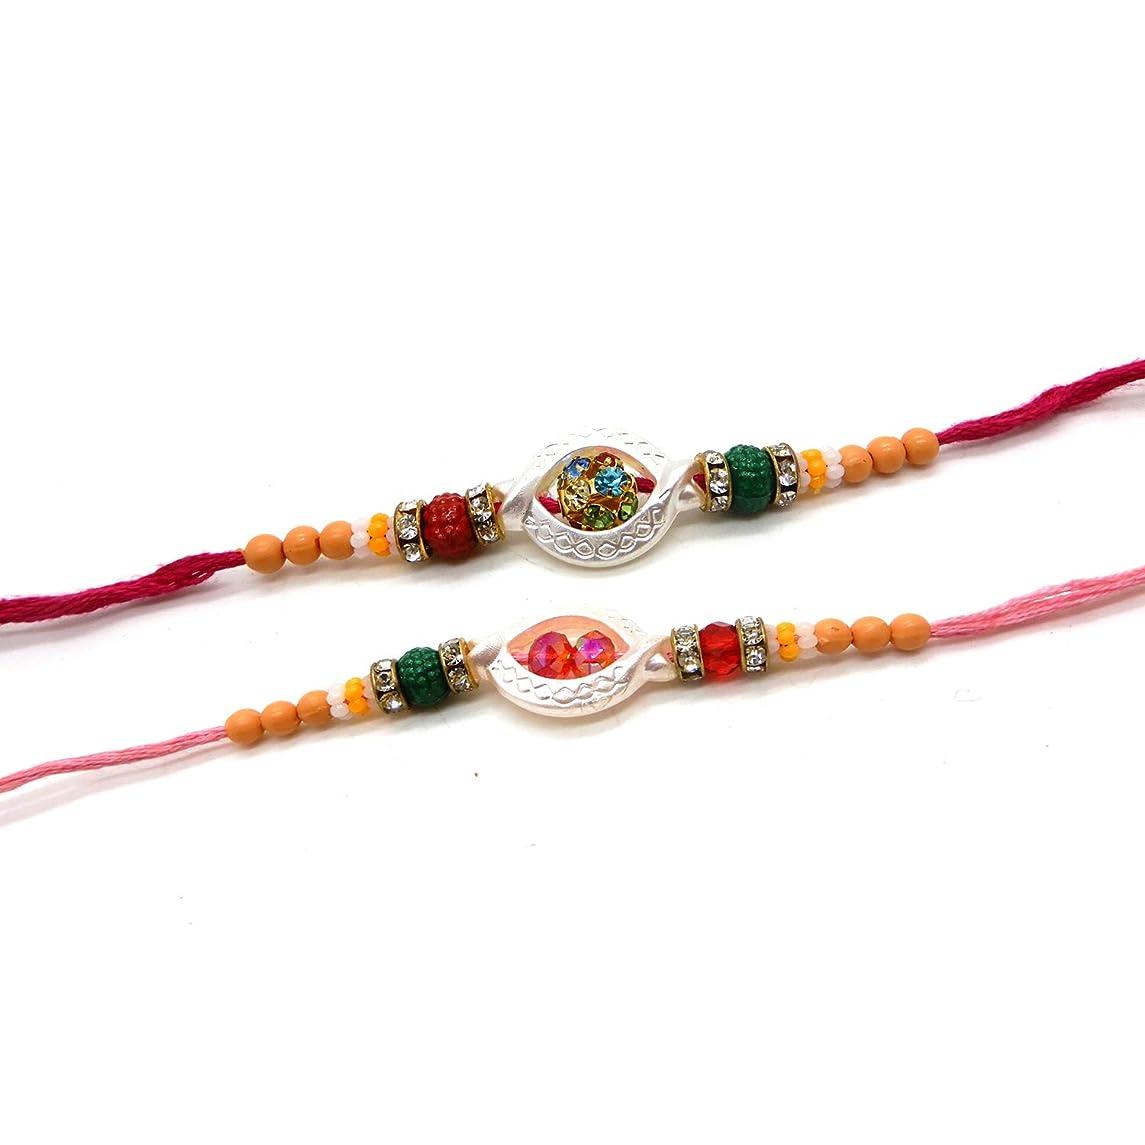 Khandekar (with device of K)) Set of Two Rakhi, Oval Shape White Ring Rudrakhsa Rakhi thread, Raksha bandhan Gift for your Brother, Vary Color And Multi Design